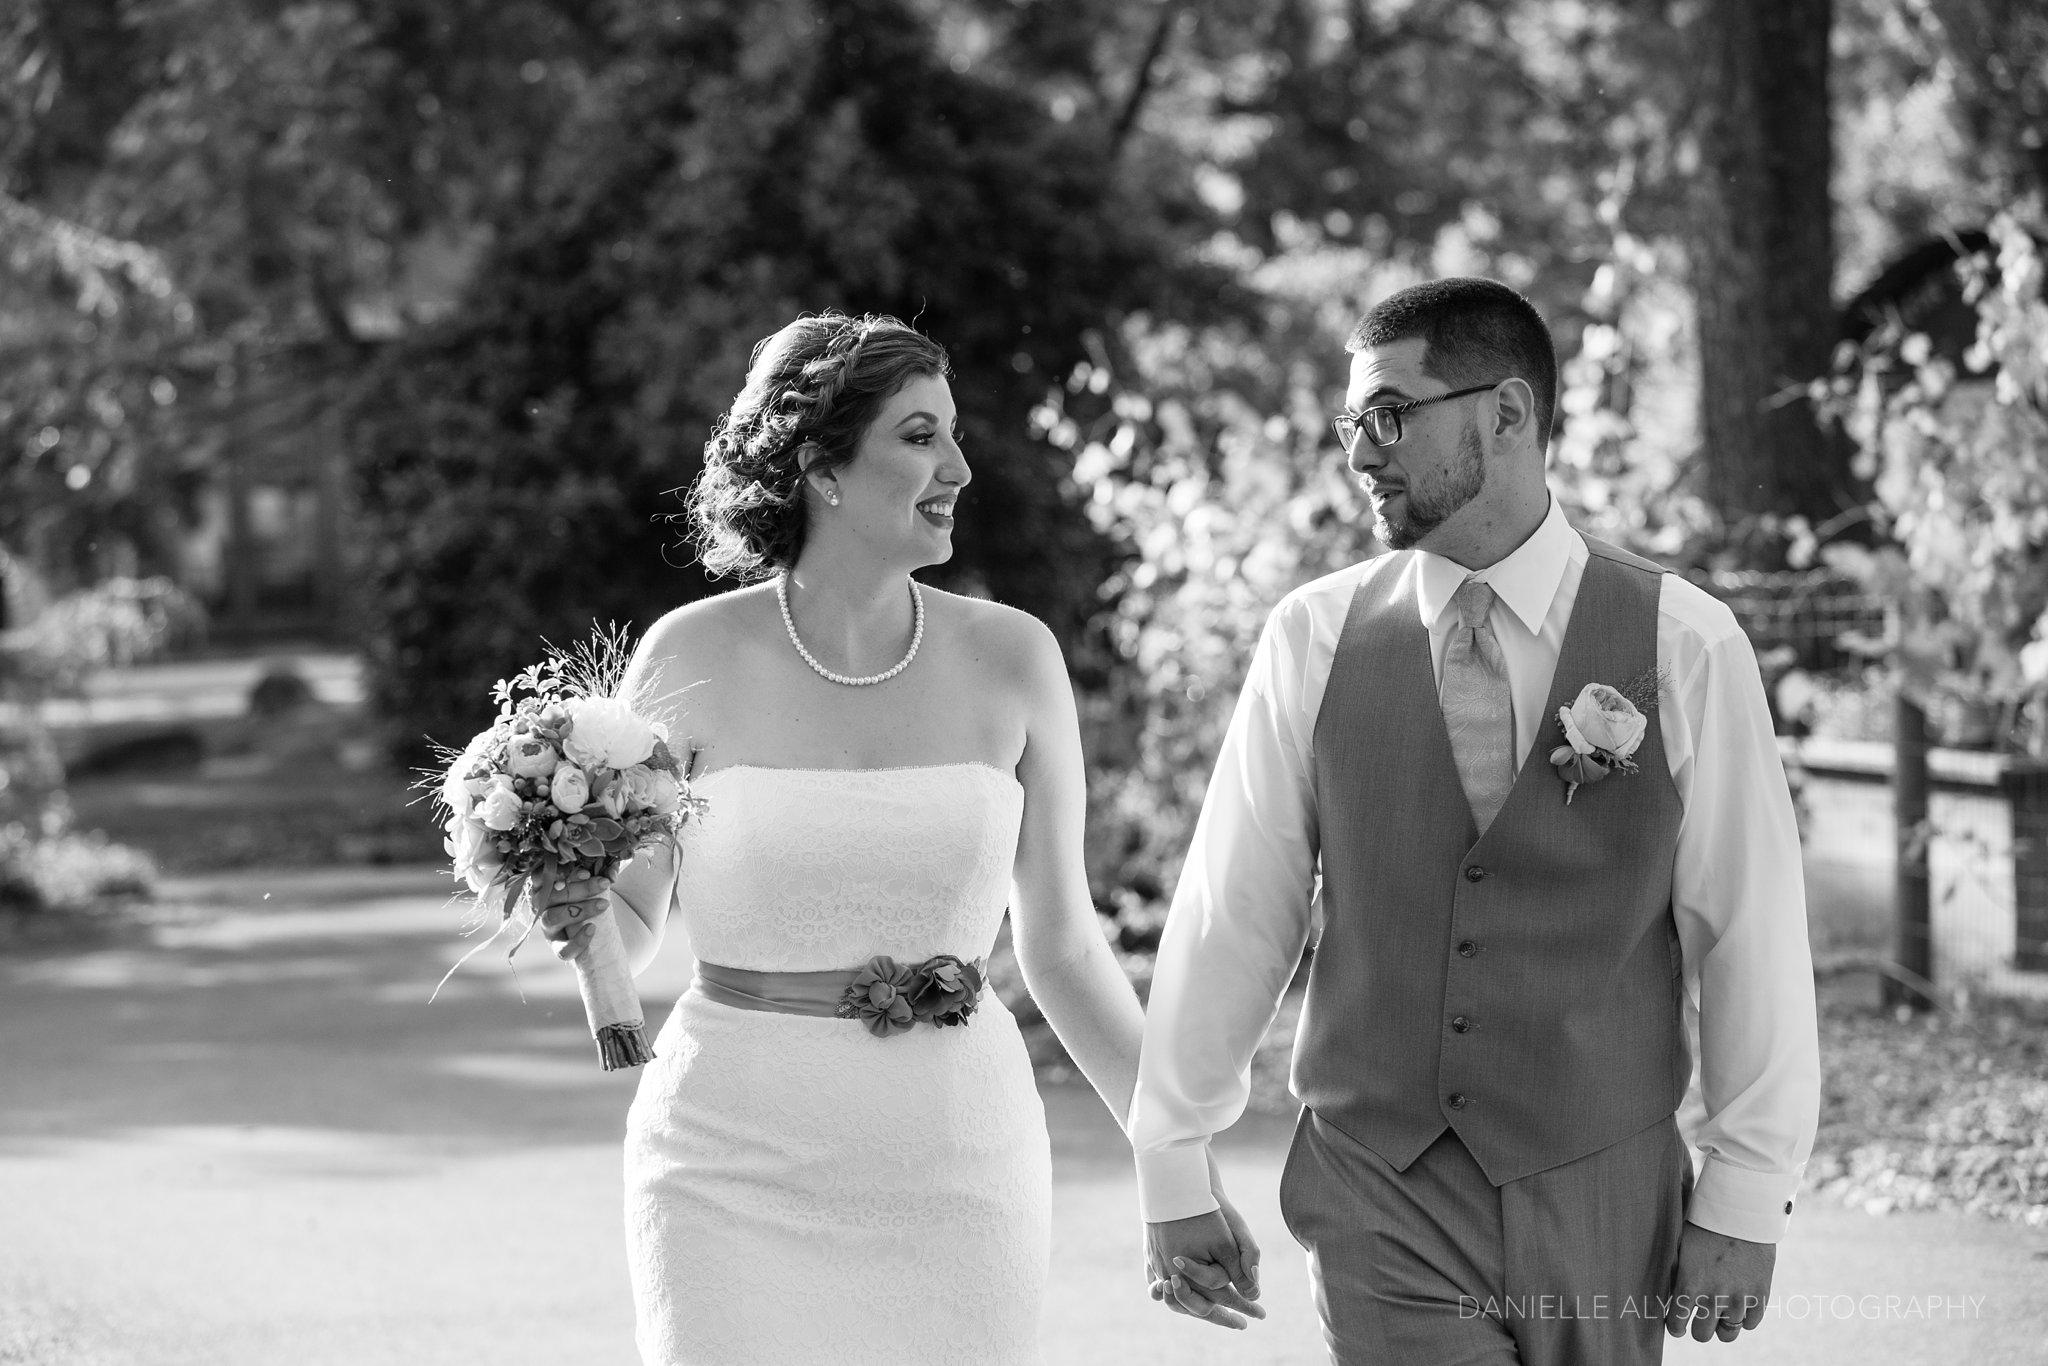 170507_blog_megan_david_wedding_loomis_flower_farm_inn_danielle_alysse_photography_sacramento_photographer0394_WEB.jpg